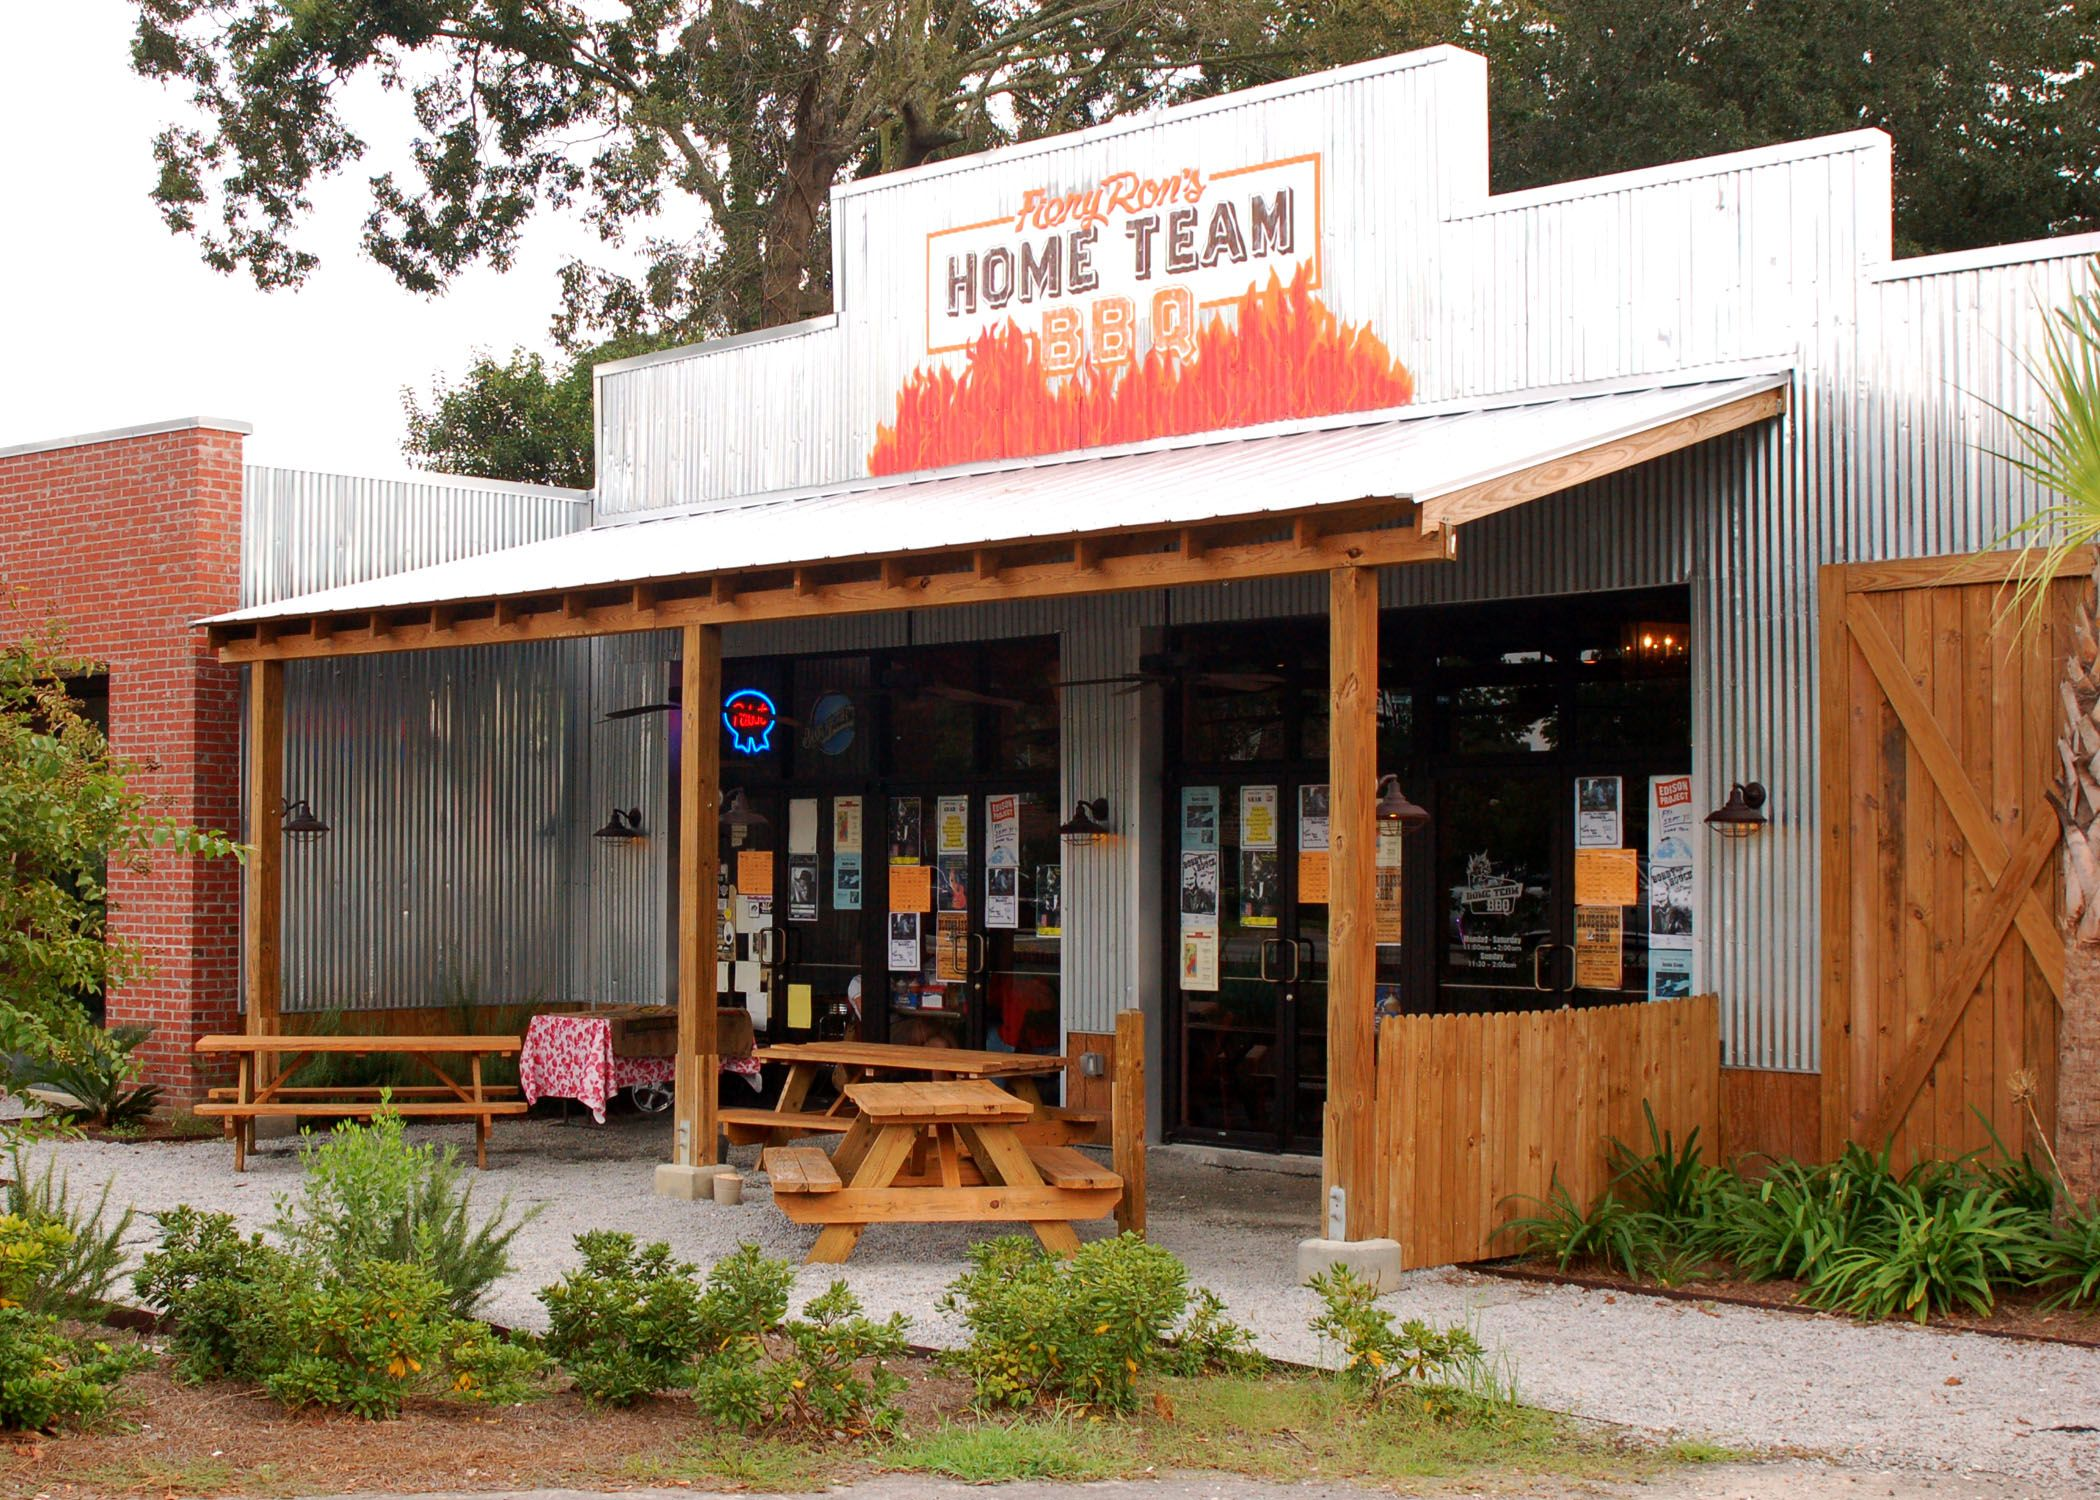 Home Team BBQ WEST ASHLEY Ashley River Road Charleston SC